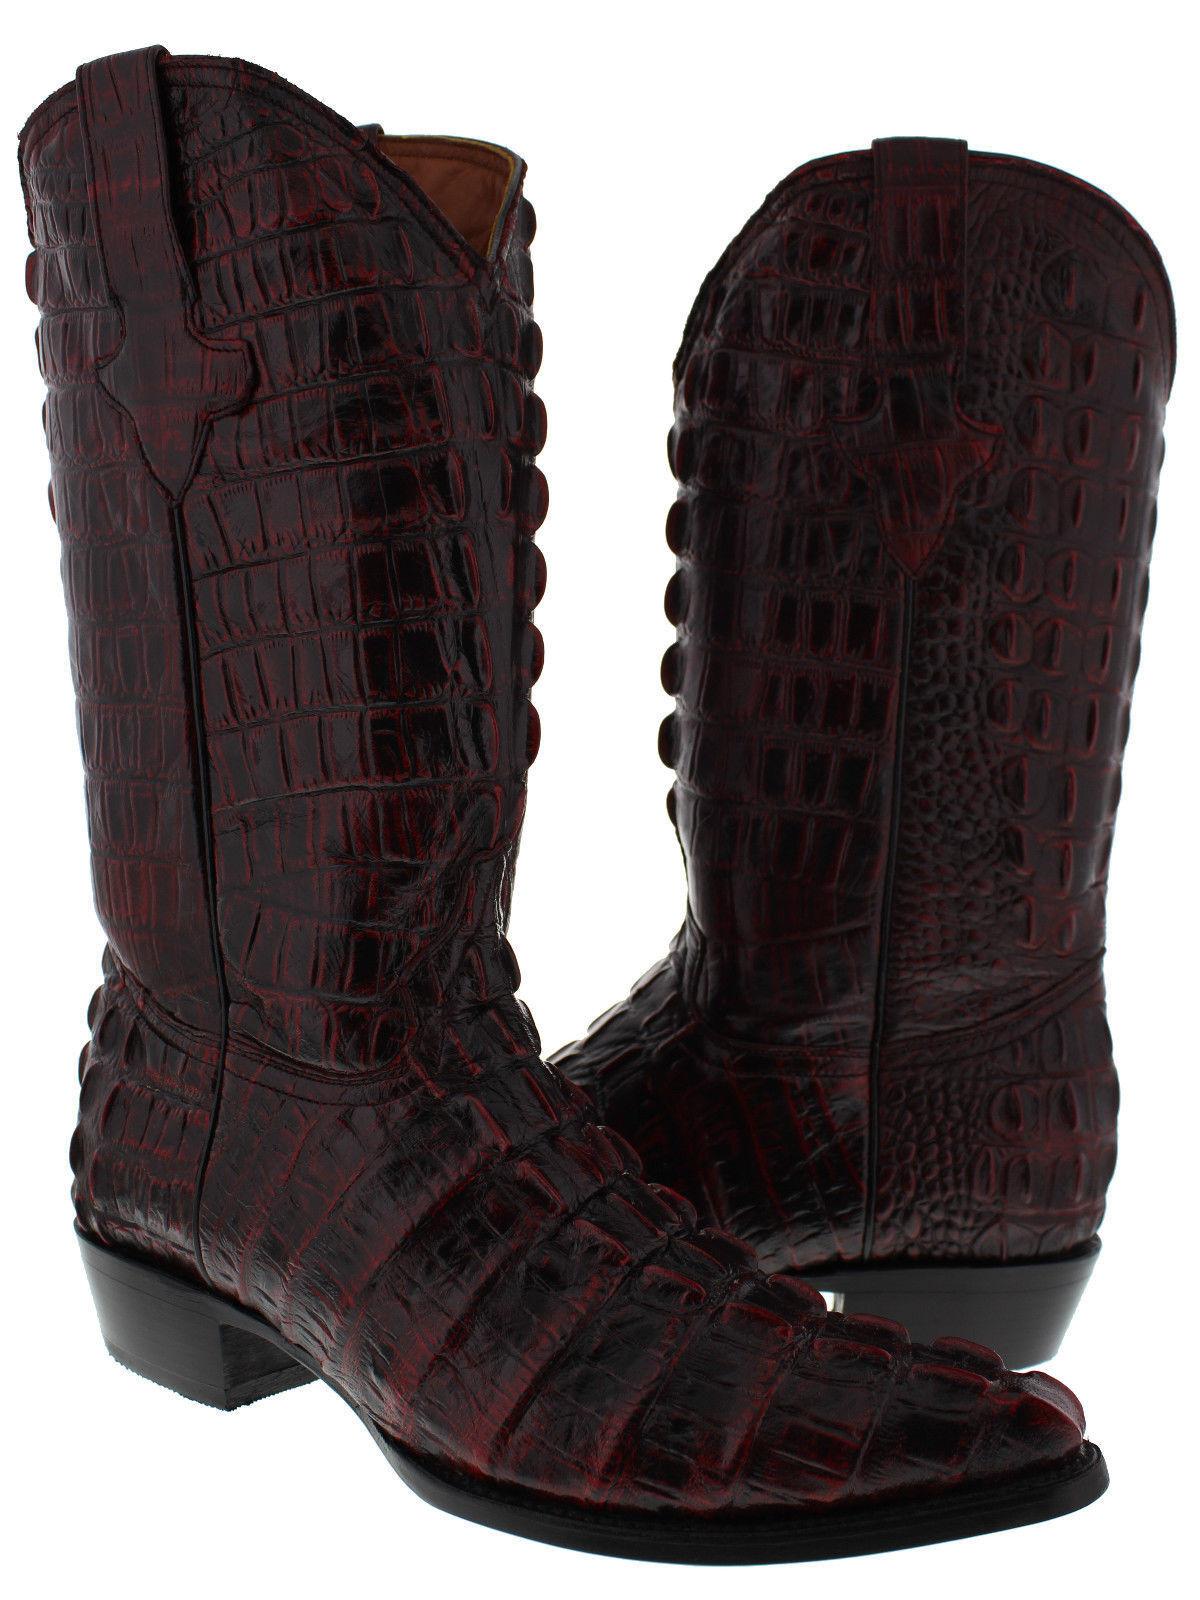 Uomo Cherry Full Full Full Alligator Print Pelle Cowboy Stivali Western Wear Pointed Toe 4e441f